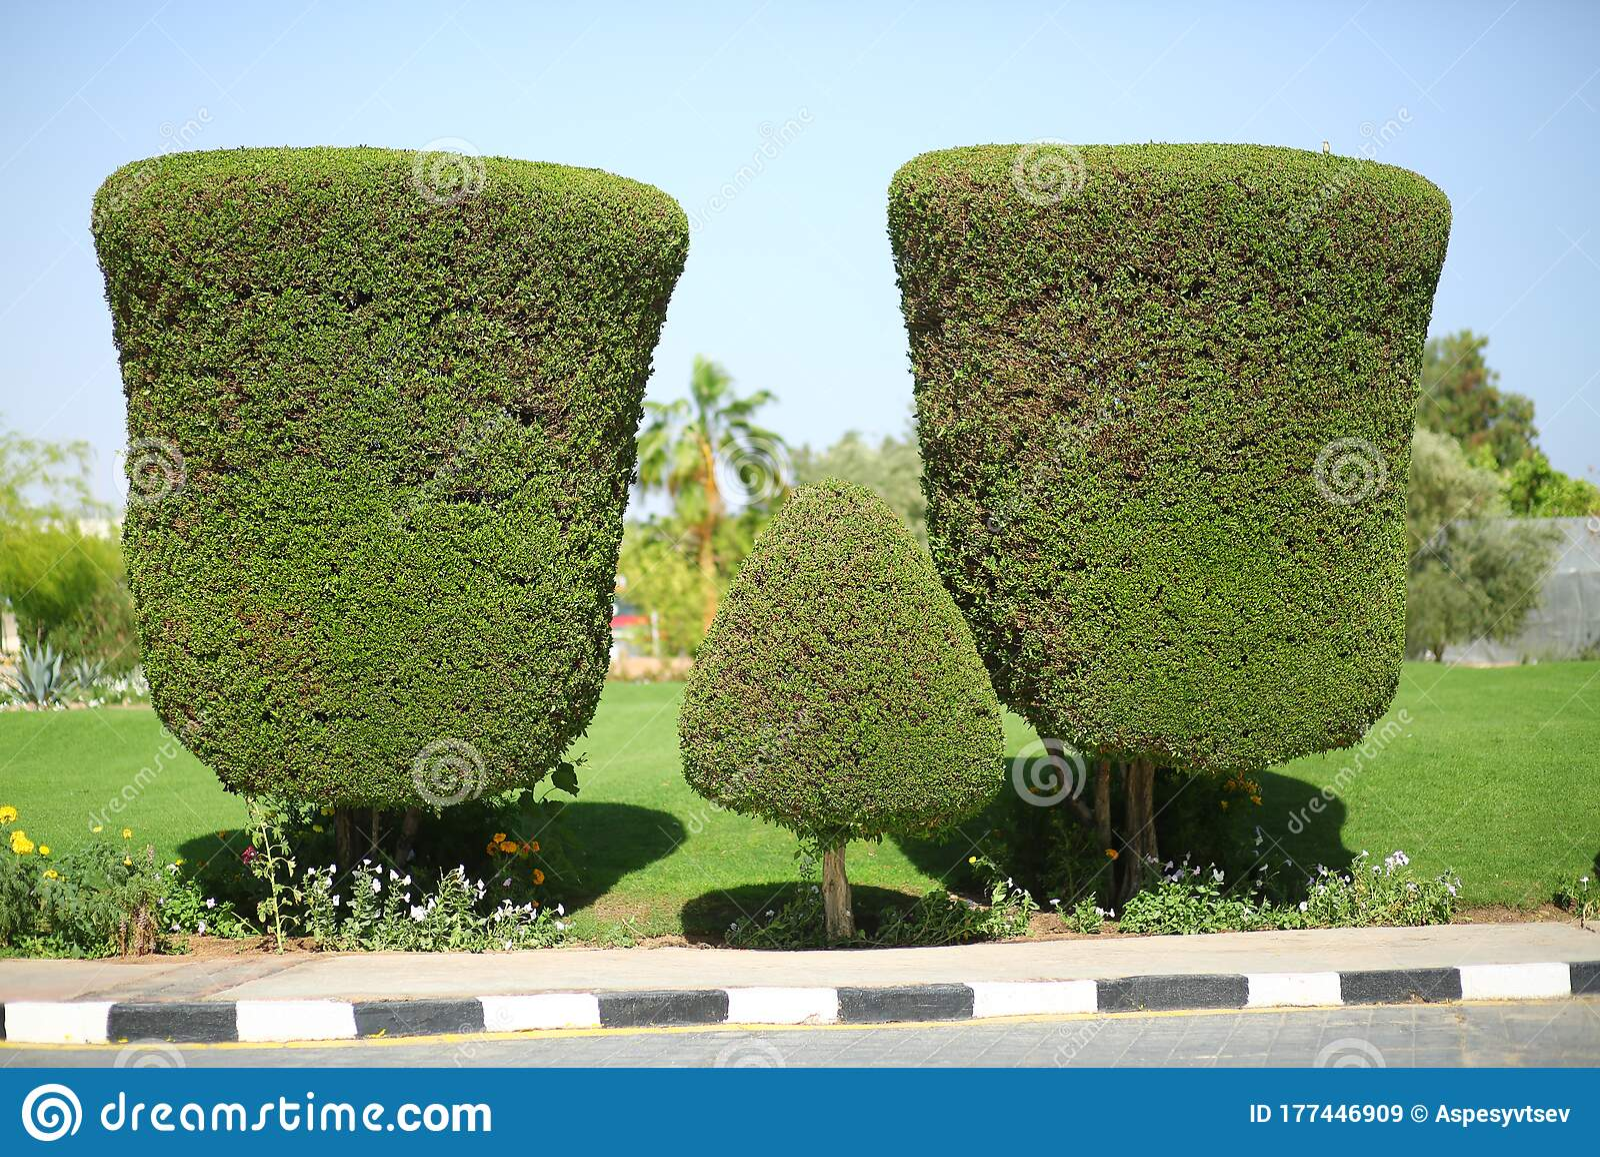 Creative Artistic Shape Topiary Tree Gardening Landscape Design Stock Image Image Of Decoration Hedge 177446909